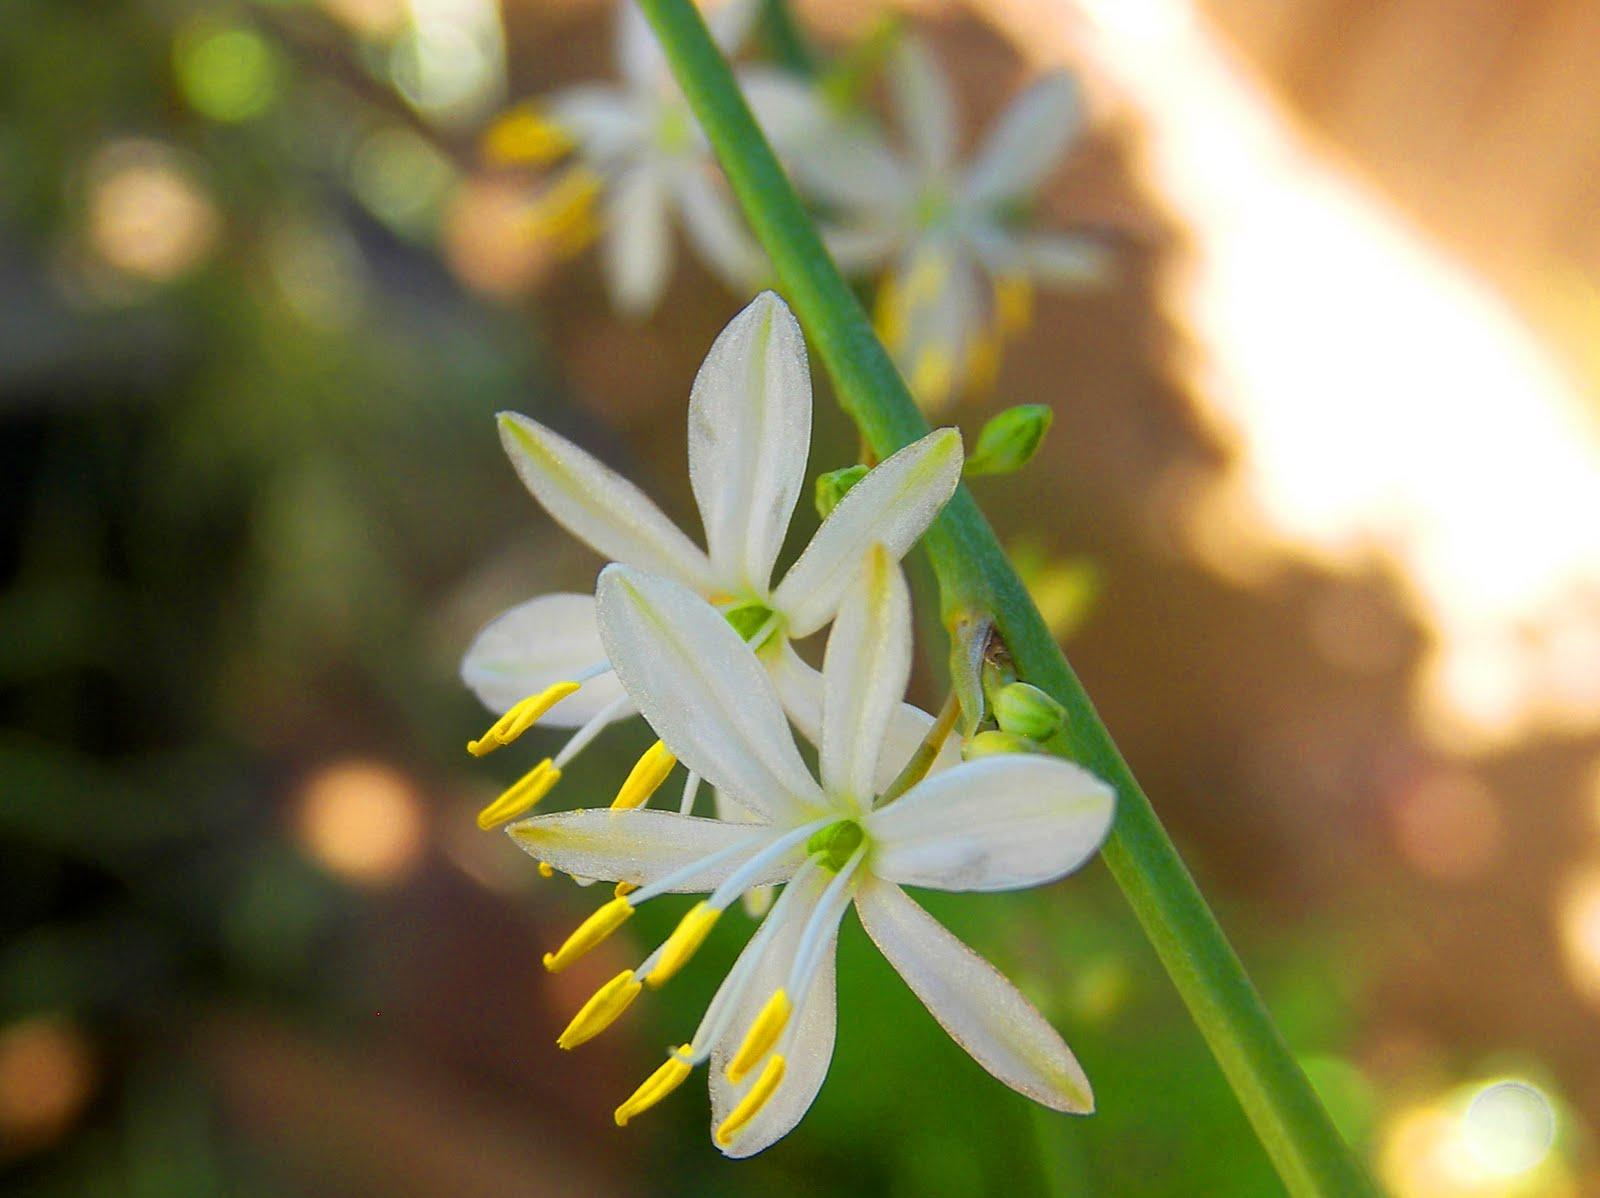 Mastering Horticulture Appreciating Detail Through my Camera